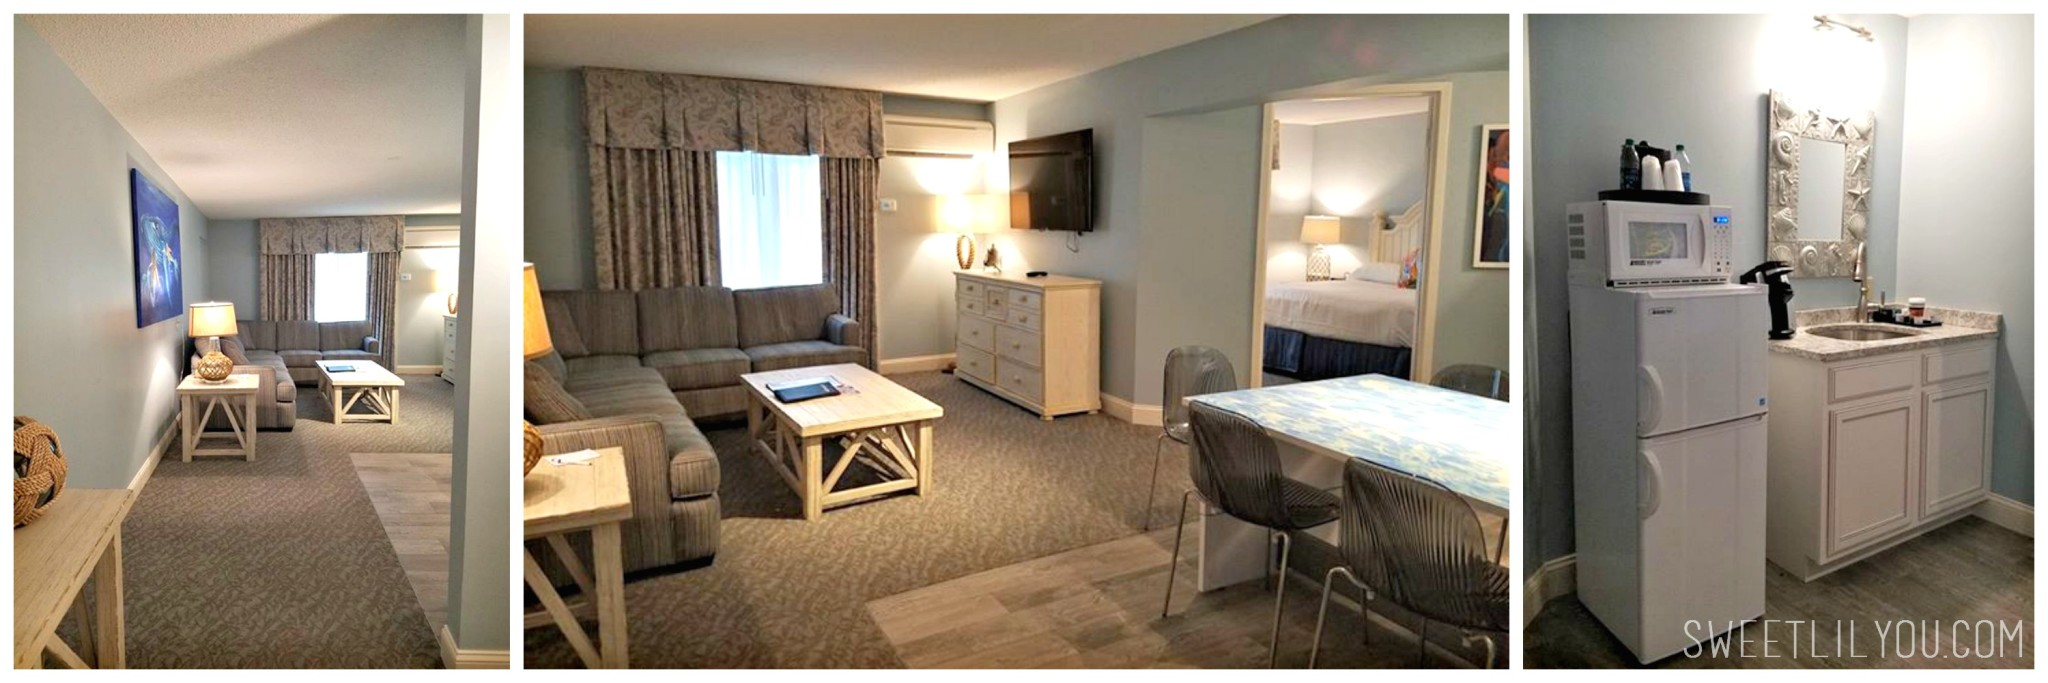 Main Room Kitchenette Cape Codder Family Suites